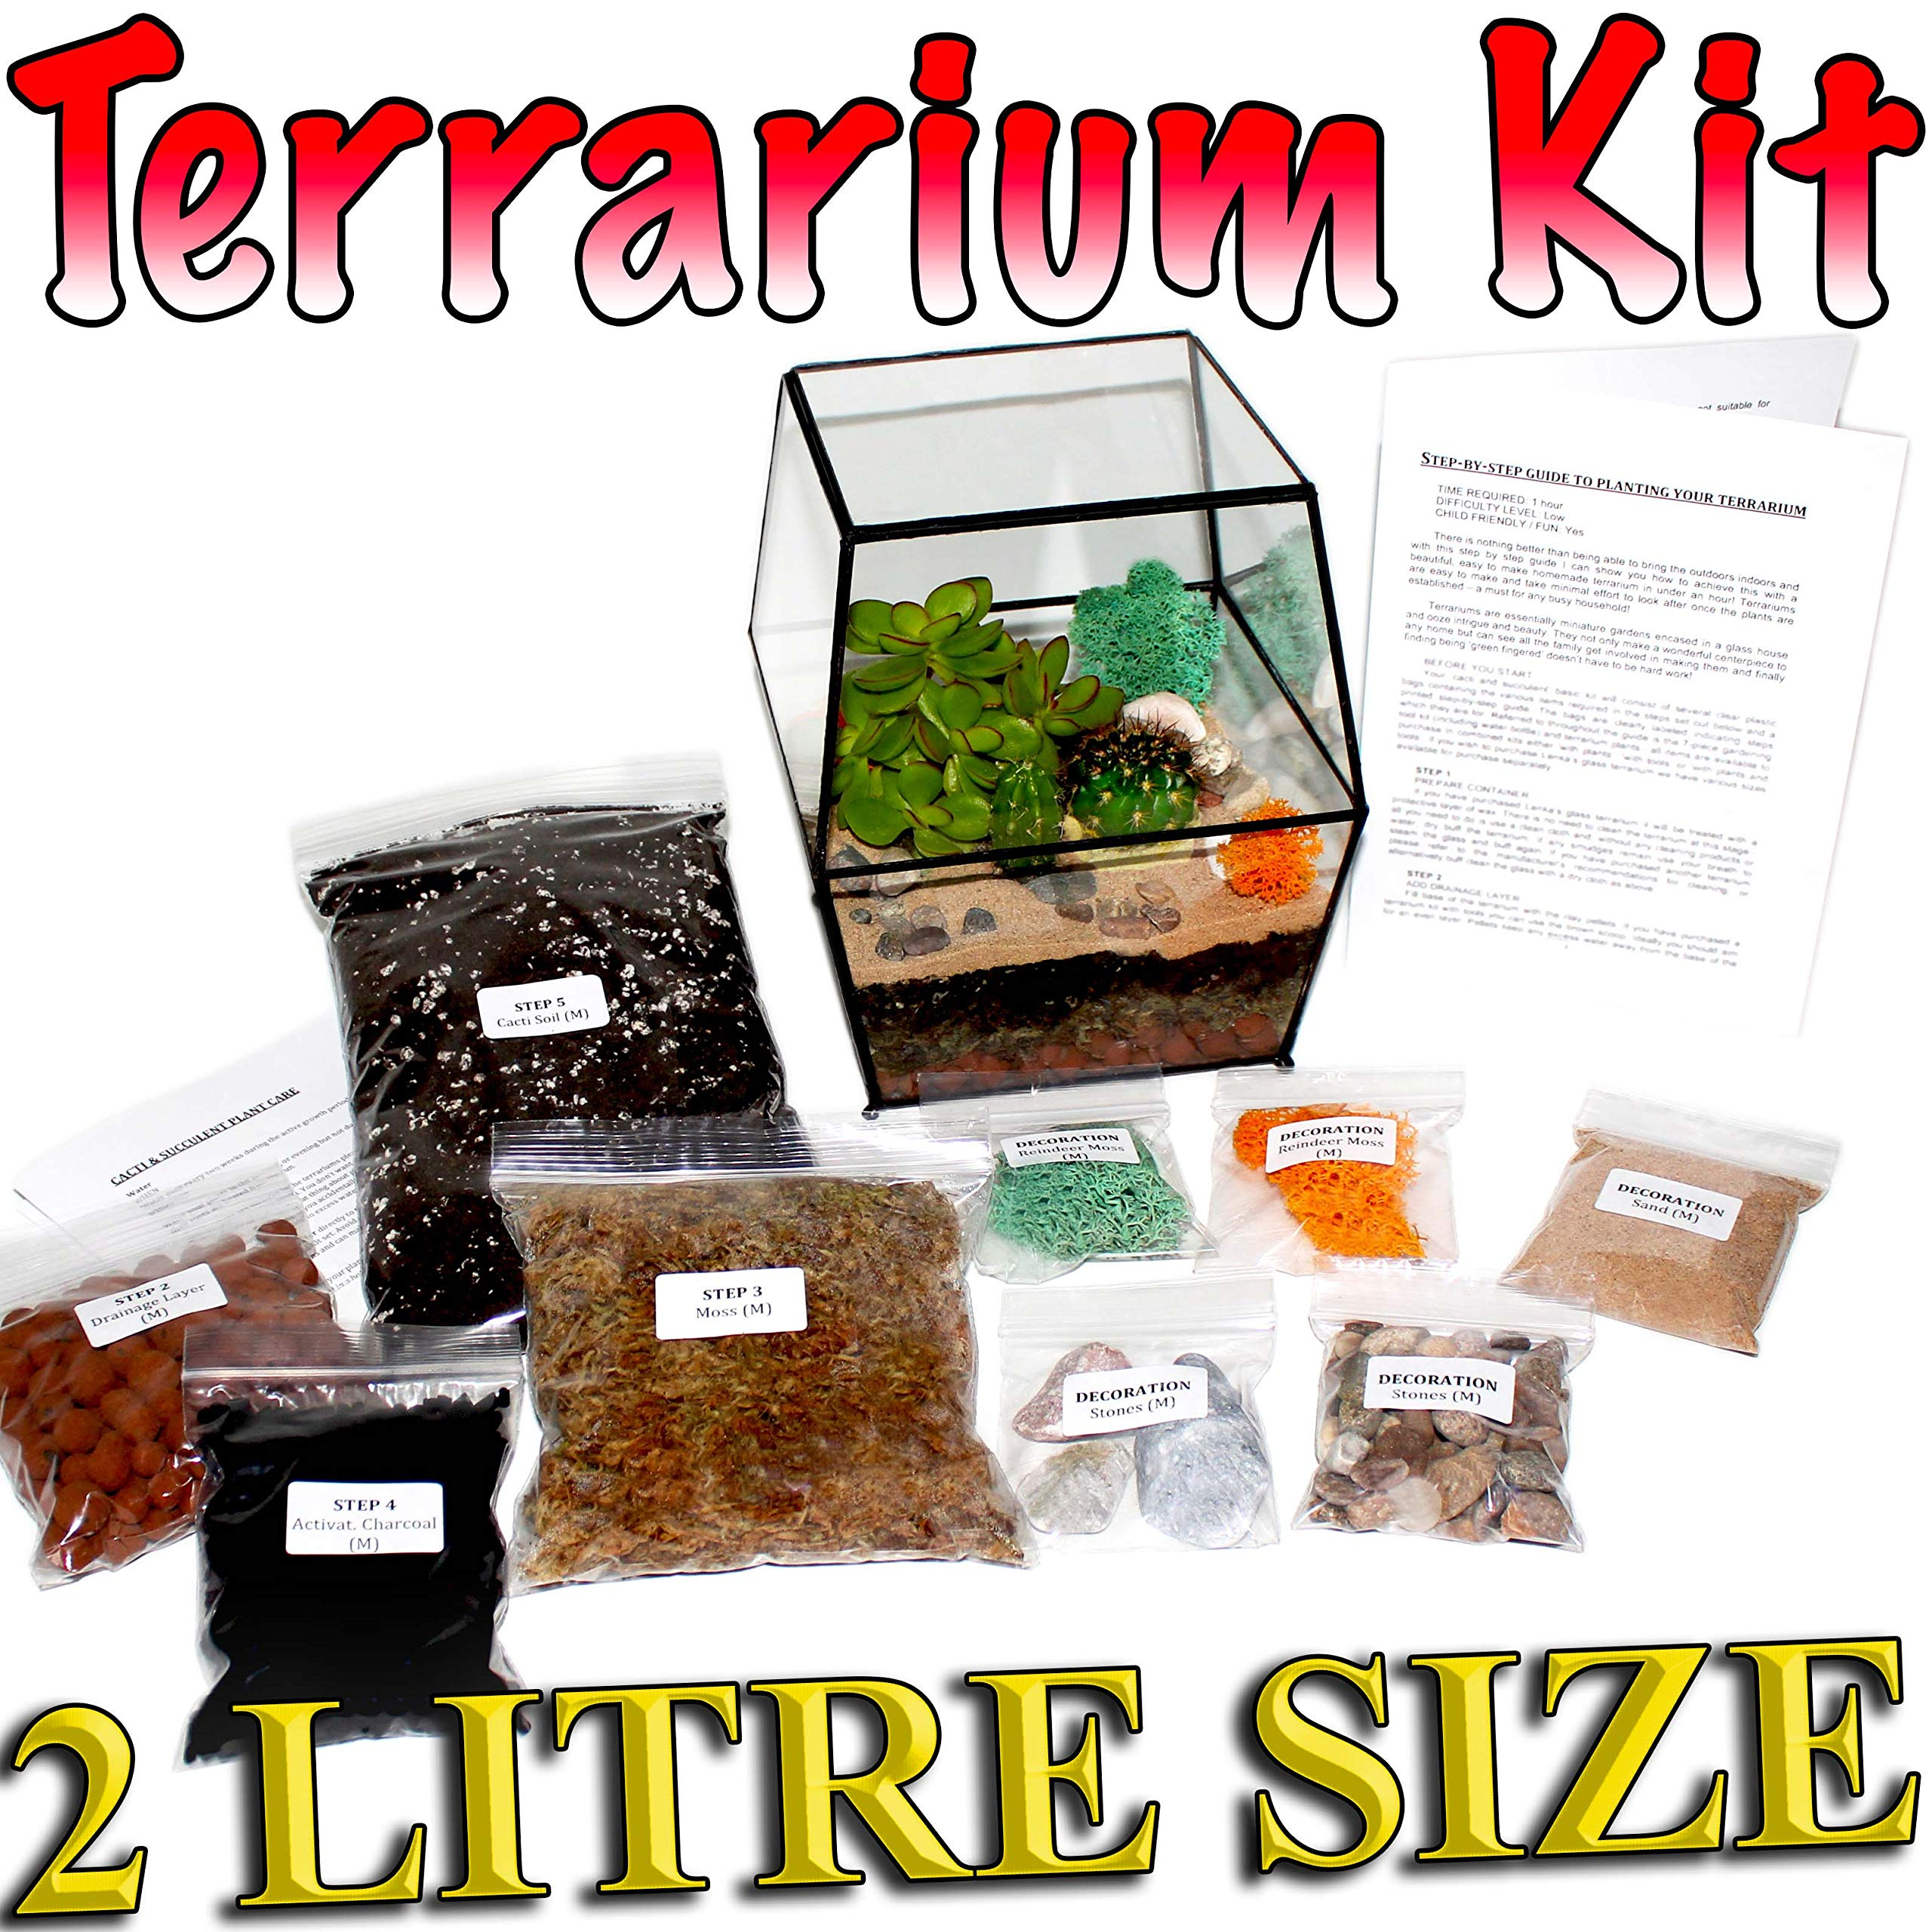 TERRARIUM FILLING KIT CHARCOAL AND ORGANIC SOIL FOR TERRARIUMS GRIT